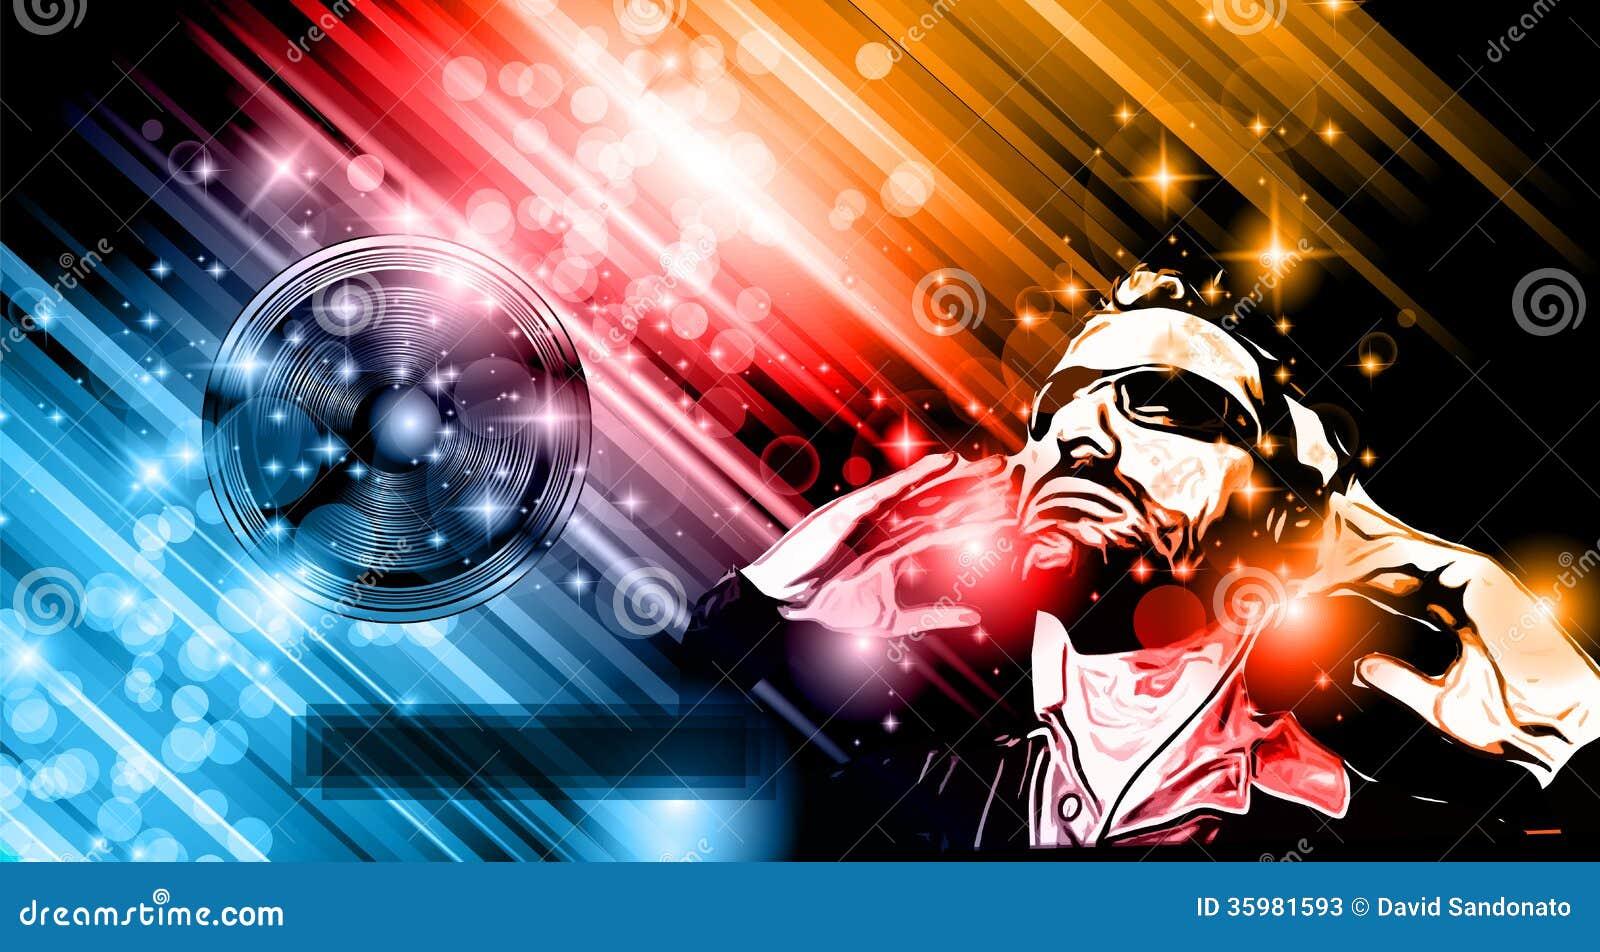 DJ Battle - La Musica